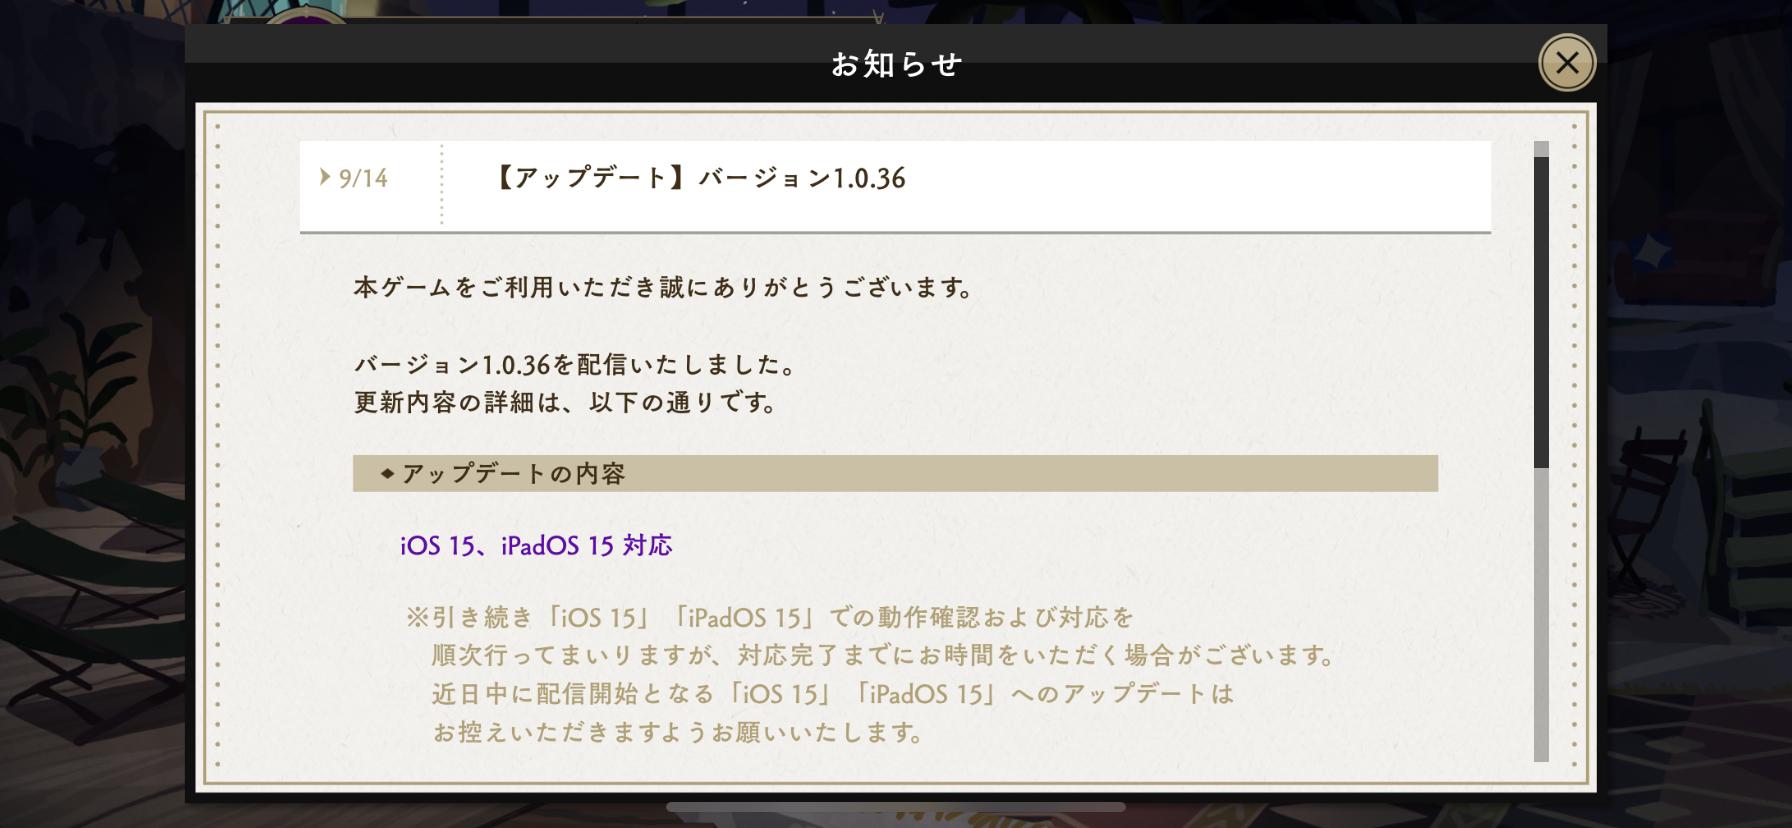 f:id:motimoti444:20210915143152p:plain